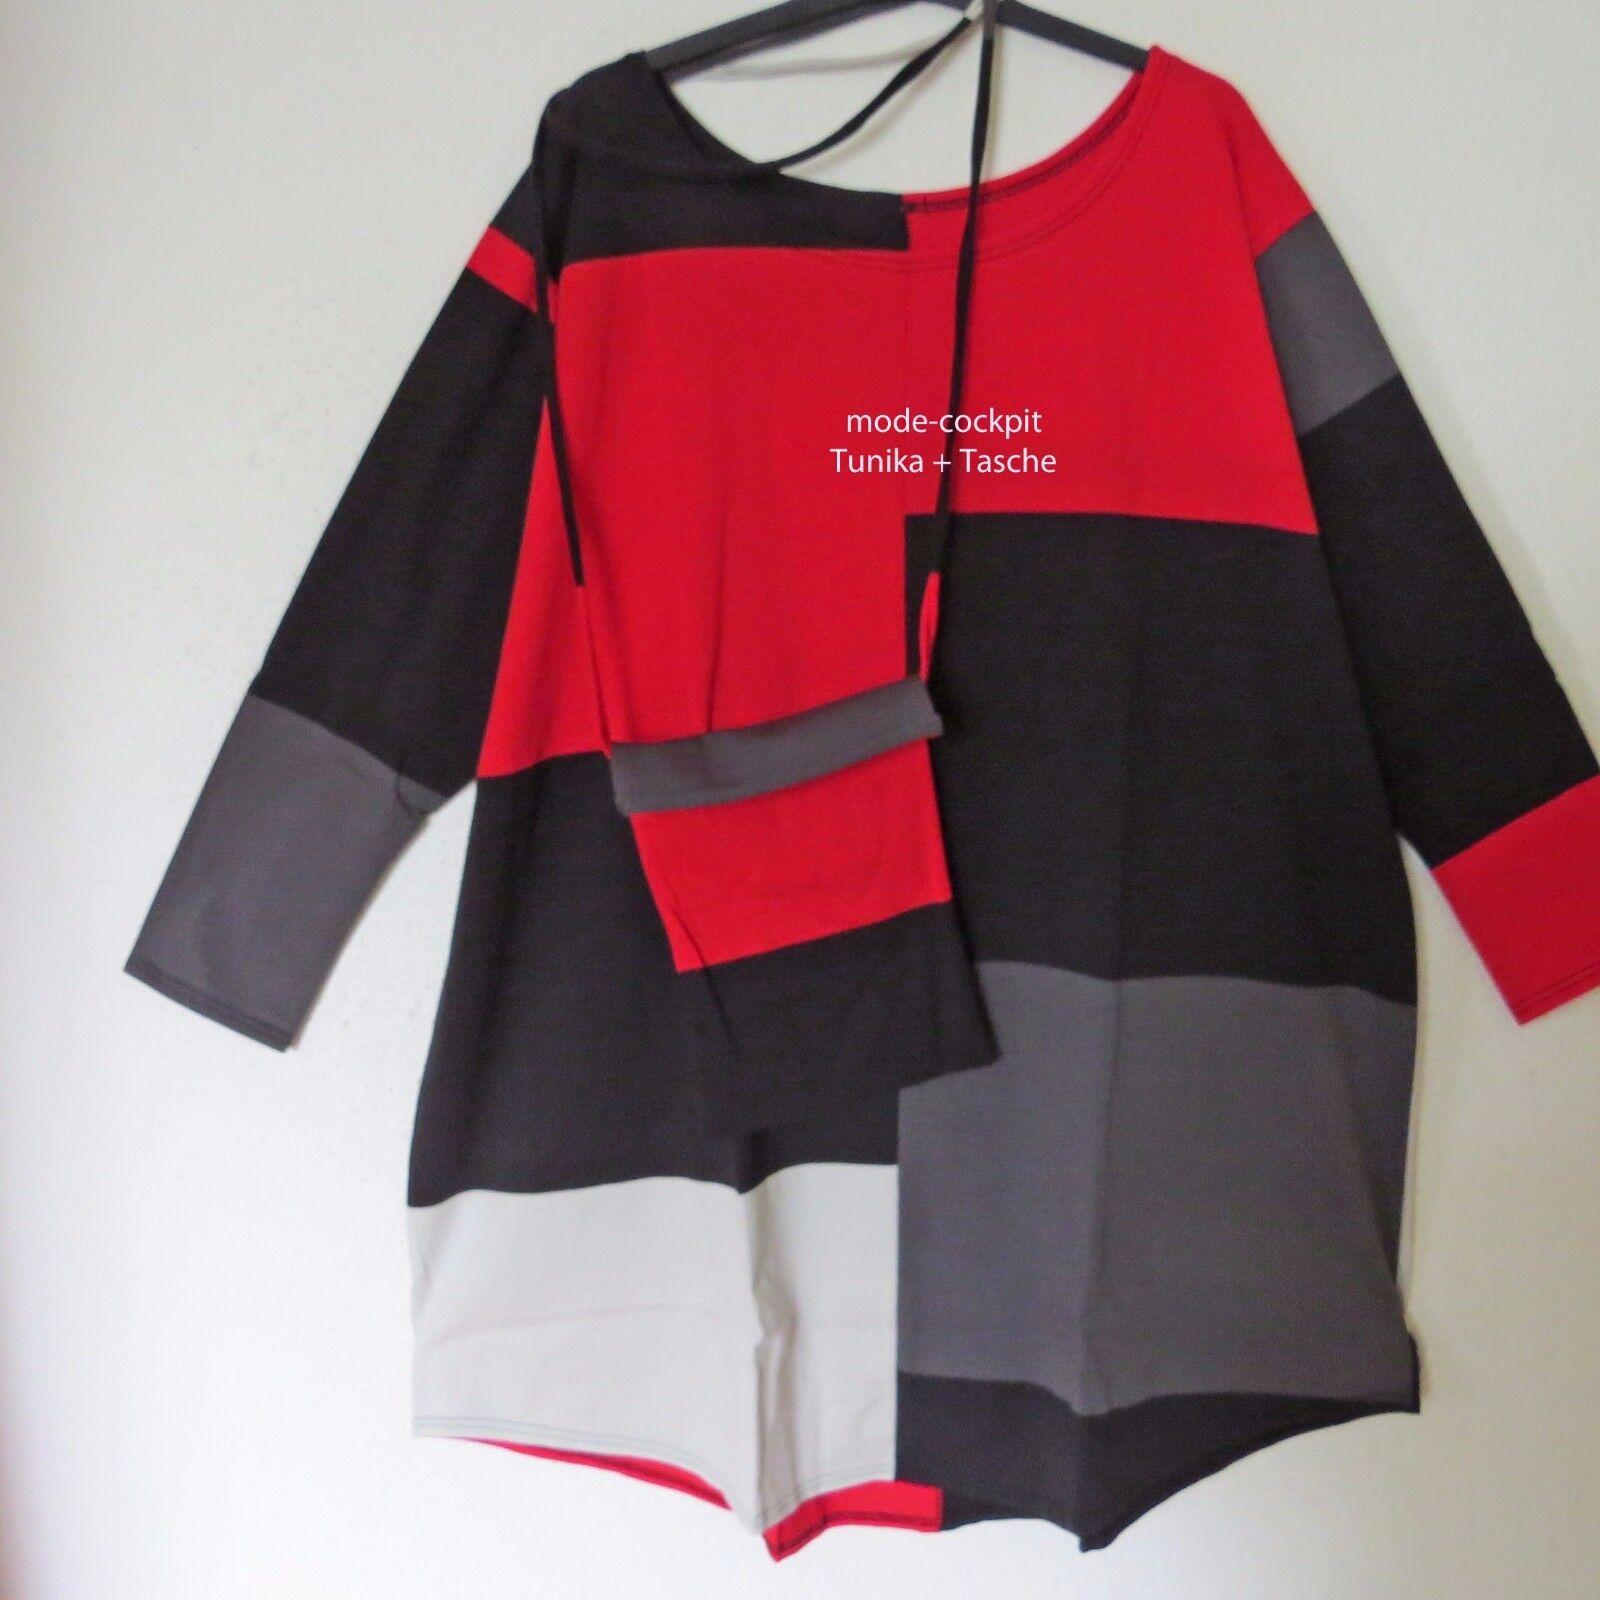 BORIS INDUSTRIES coole Tunika Long Shirt+Tasche Patch schwarz-rot 50-54 (3)